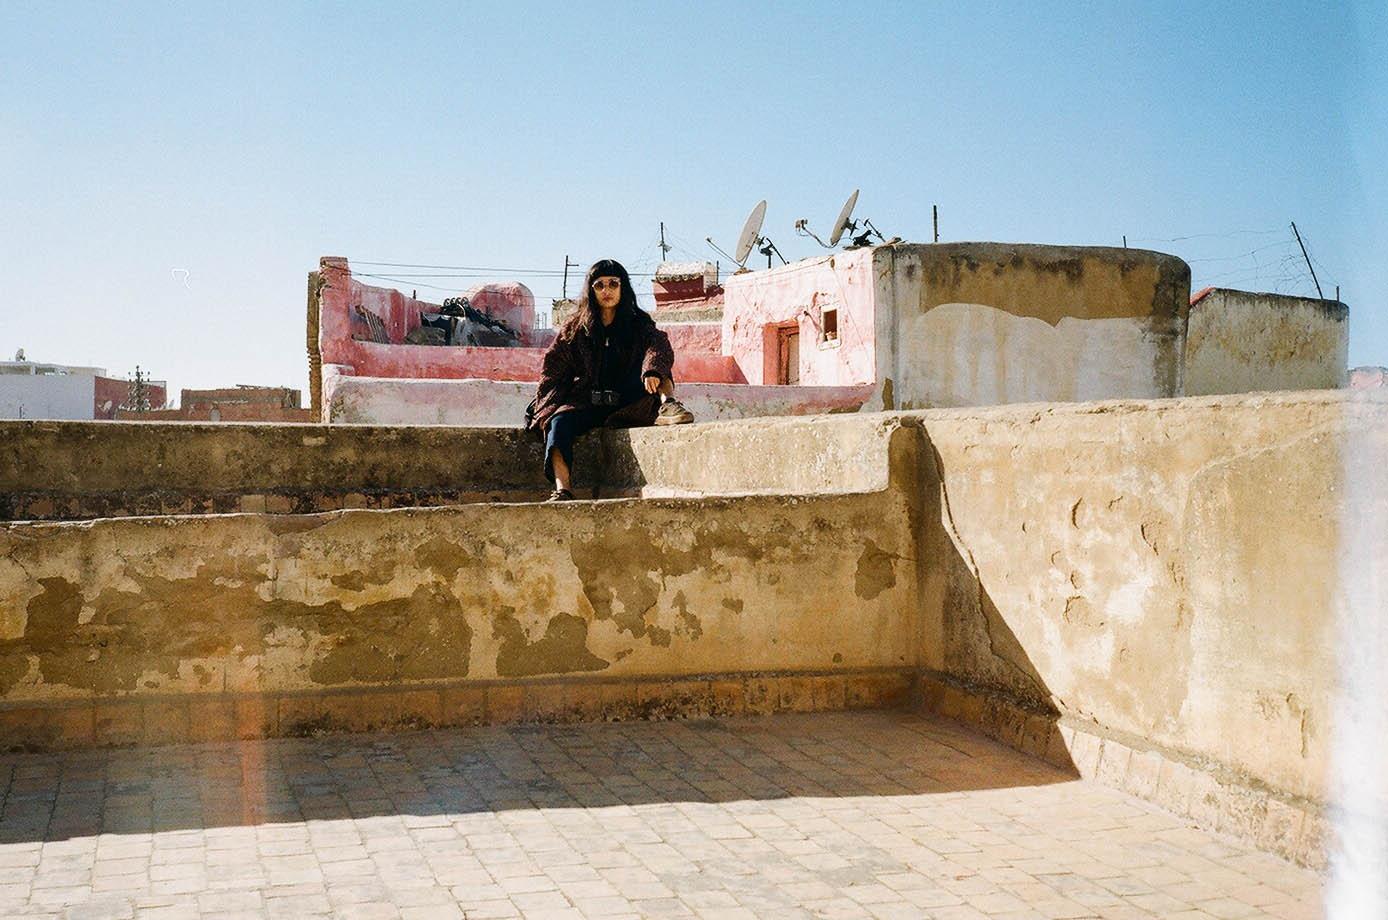 Morocco_Helen_Västrik_-48.jpg